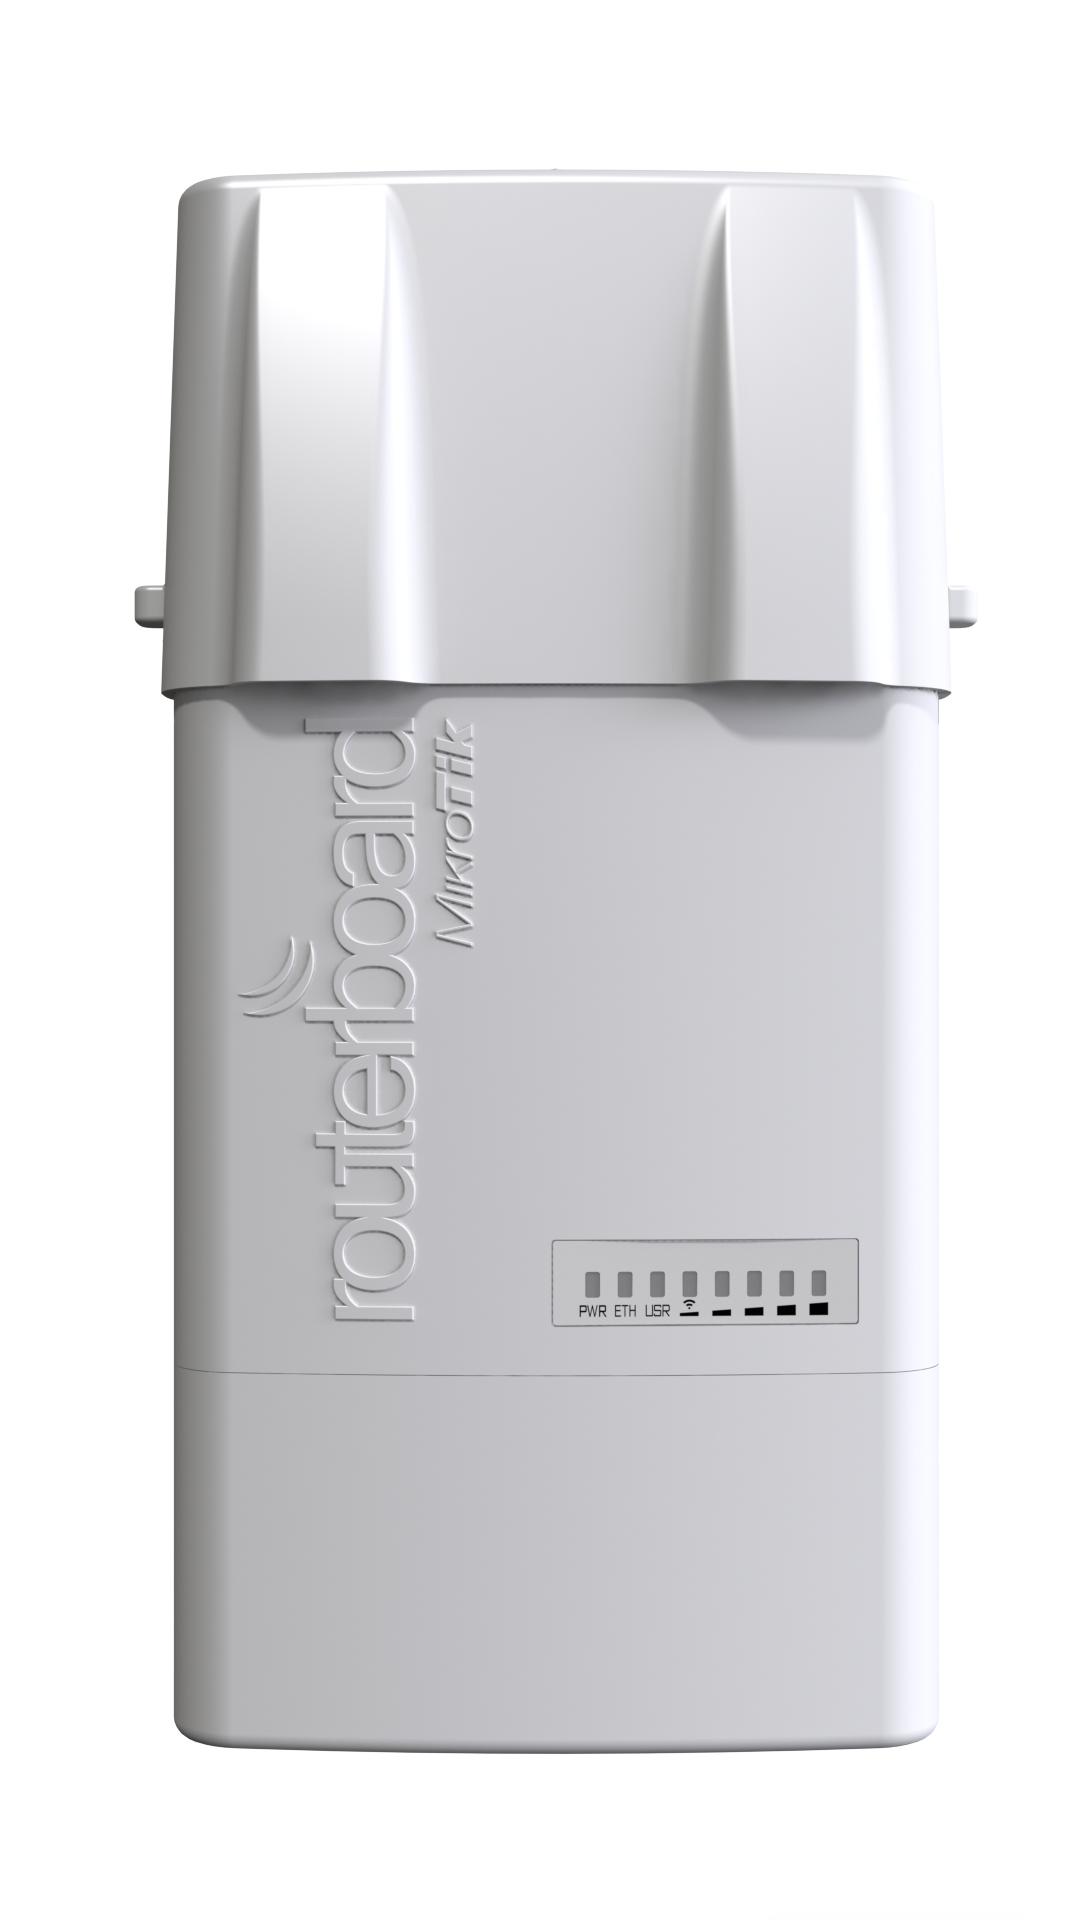 Mikrotik BaseBox 5 Power over Ethernet (PoE) Grey WLAN access point